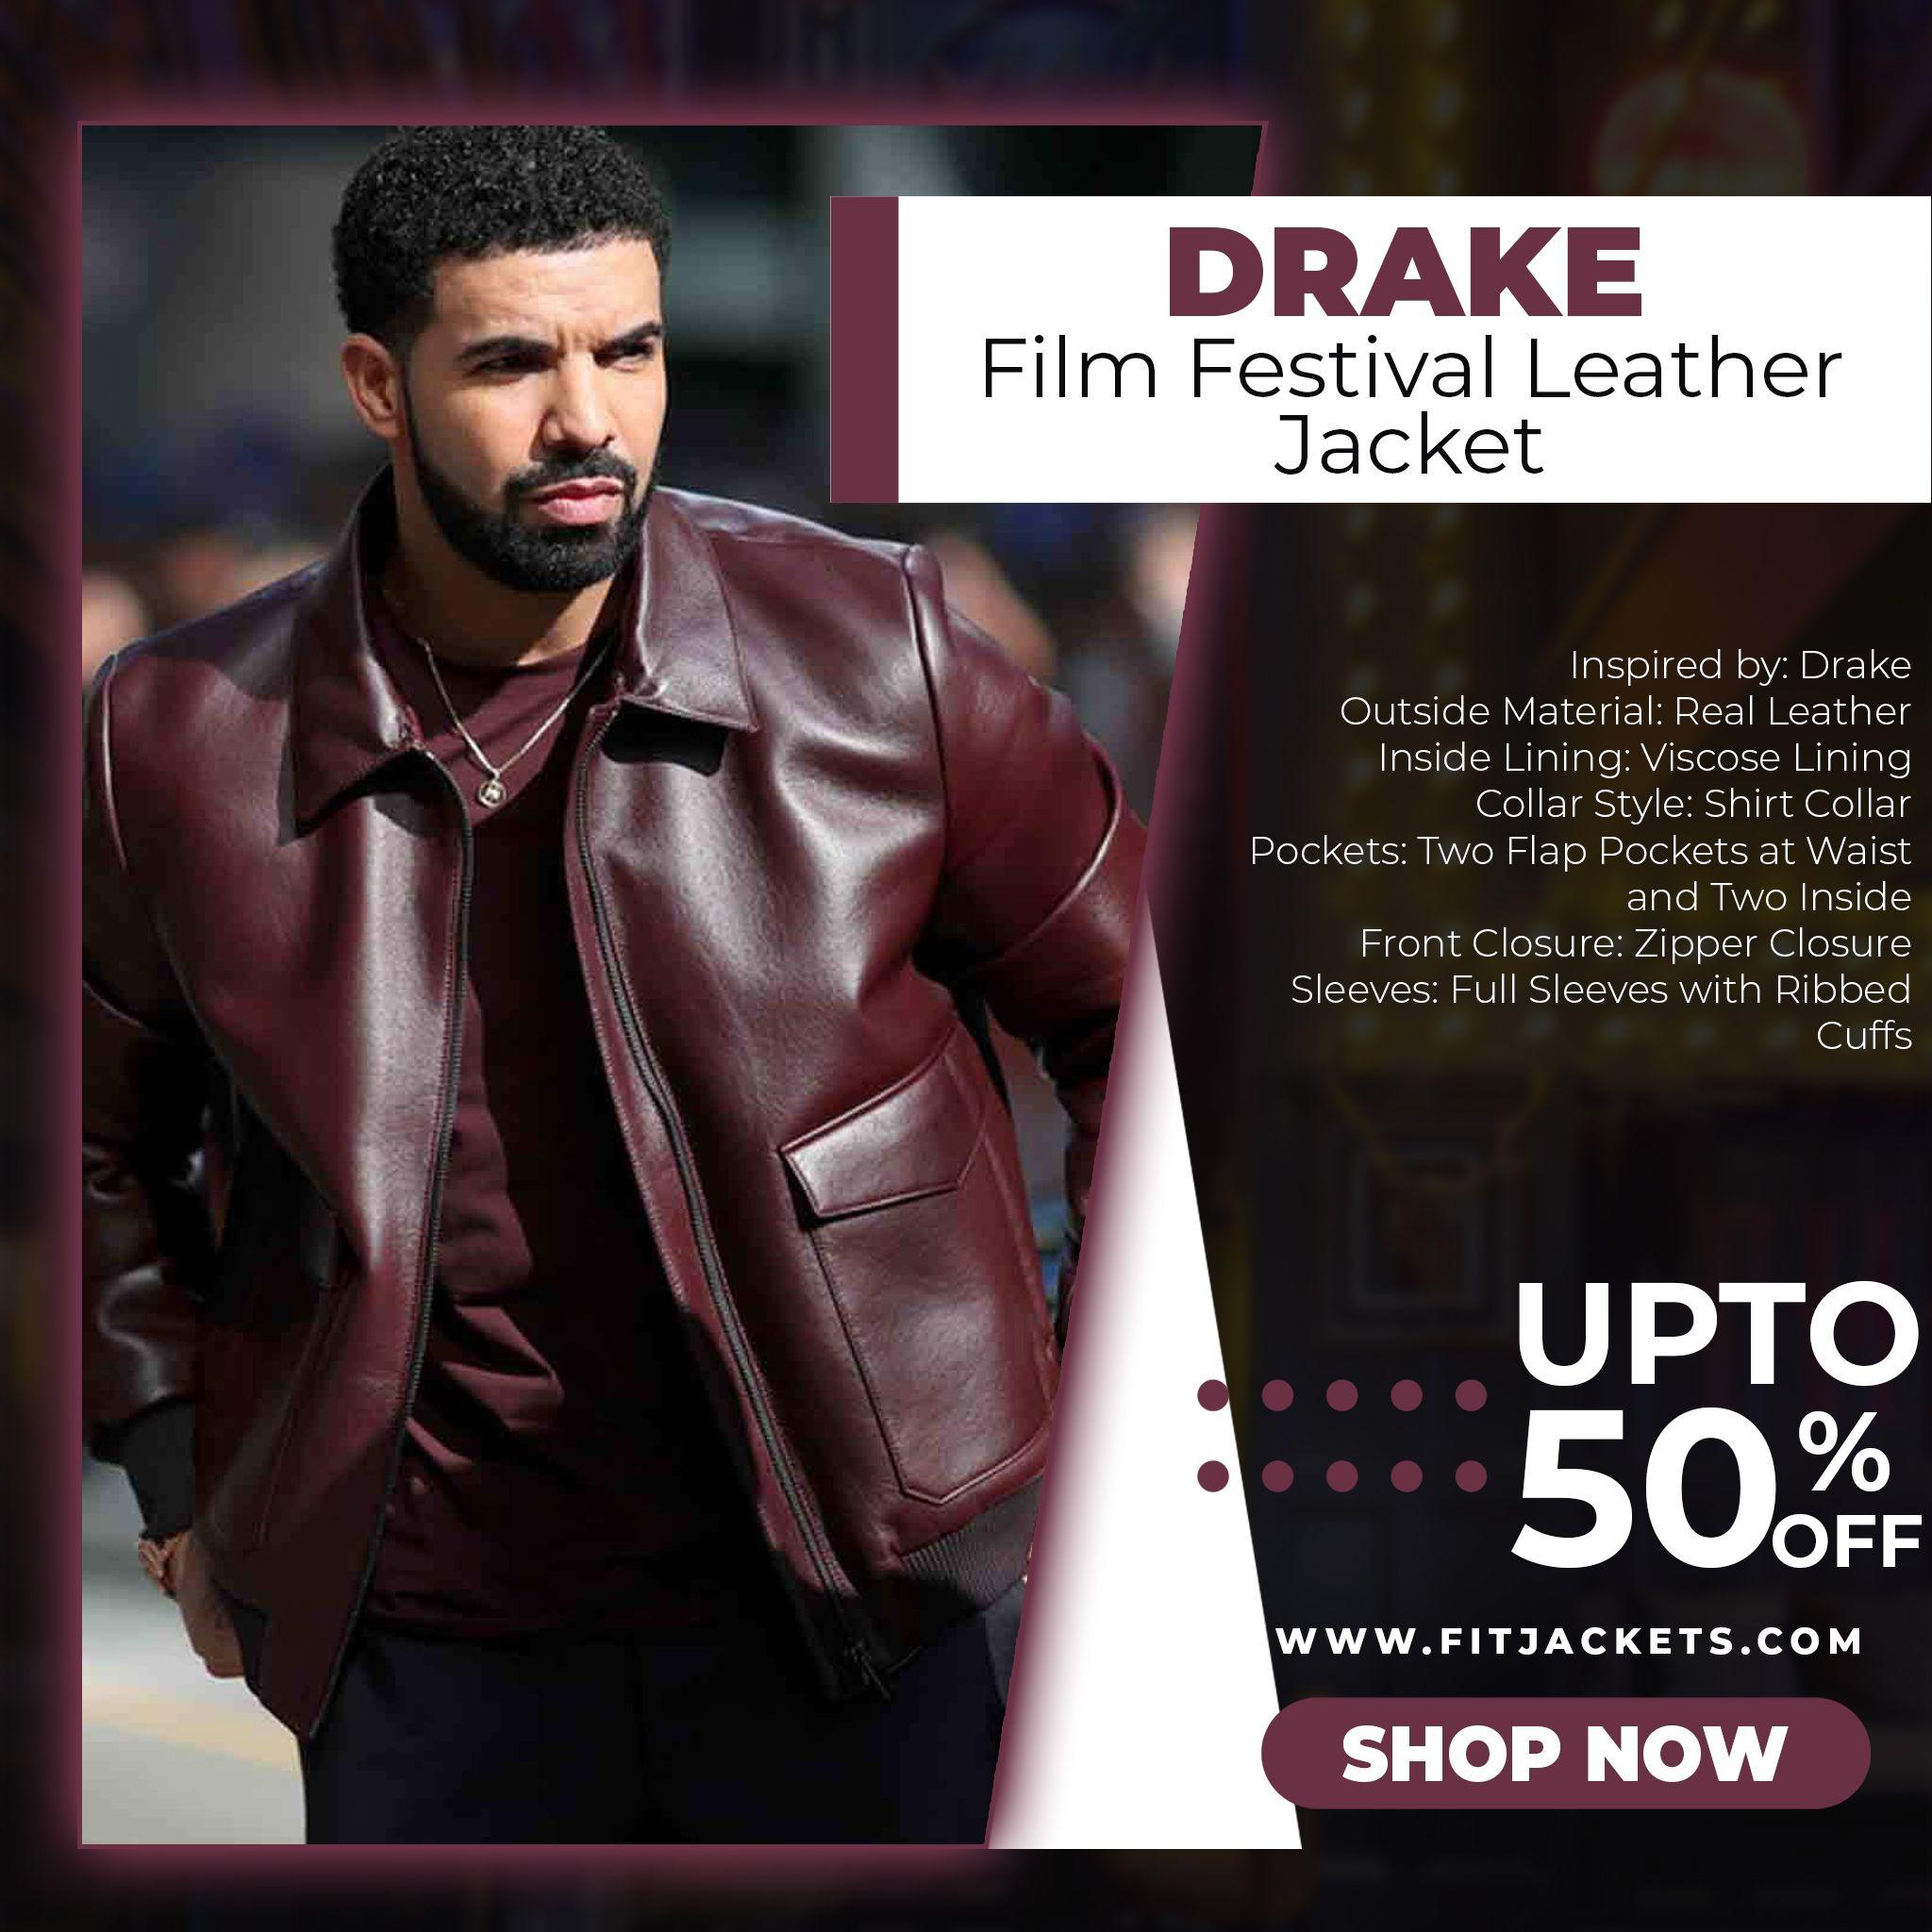 Drake Film Festival Leather Jacket Leather Jacket Outfit Men Burgundy Bomber Jacket Leather Jacket [ 2048 x 2048 Pixel ]